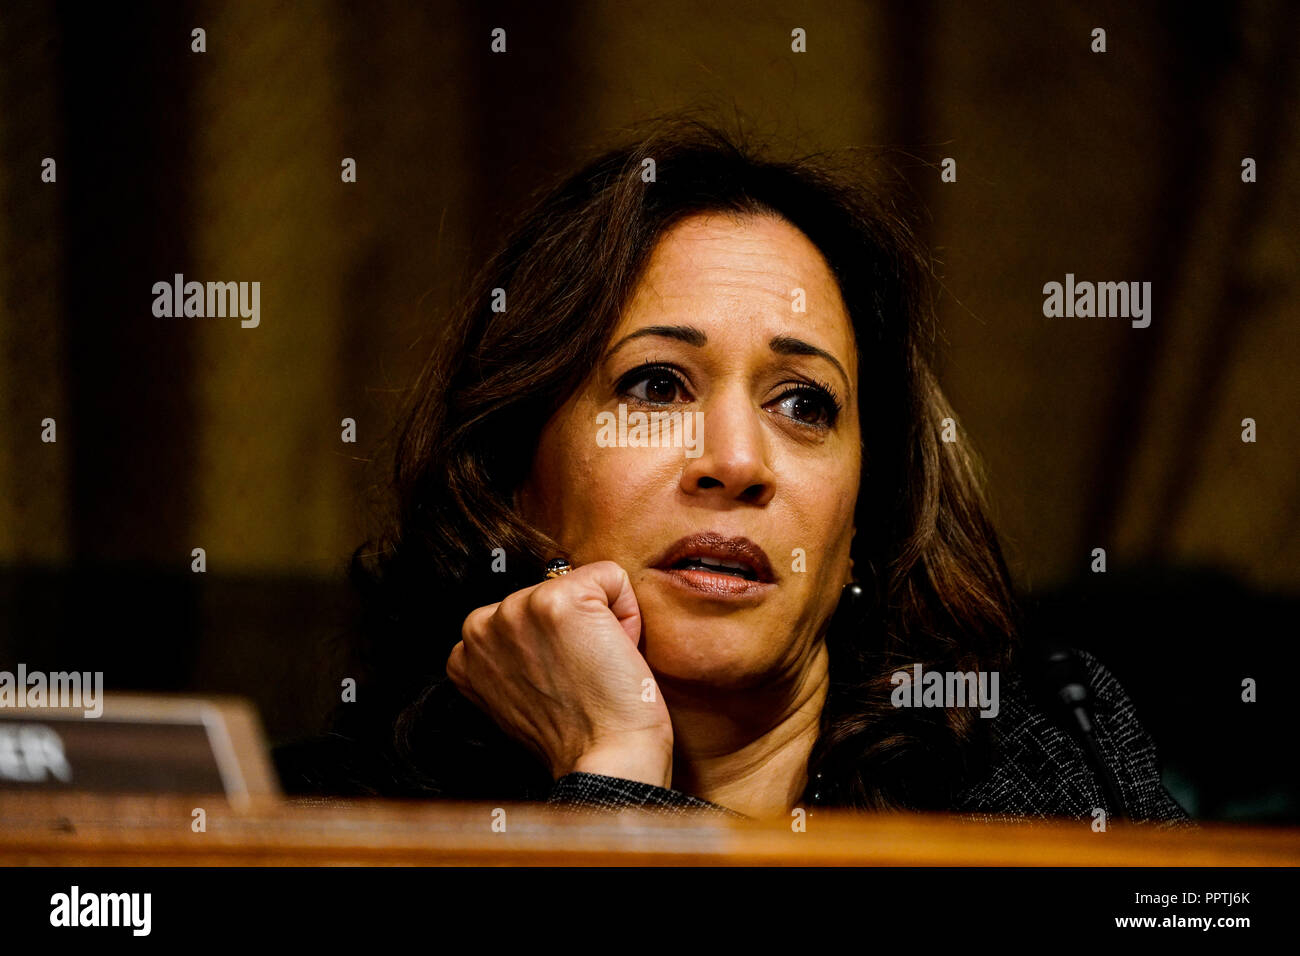 WASHINGTON, DC - SEPTEMBER 27: Sen. Kamala D. Harris (D-Calif.) at a Senate Judiciary Committee hearing on Thursday, September 27, 2018 on Capitol Hill. (Melina Mara/Pool/The Washington Post) | usage worldwide - Stock Image